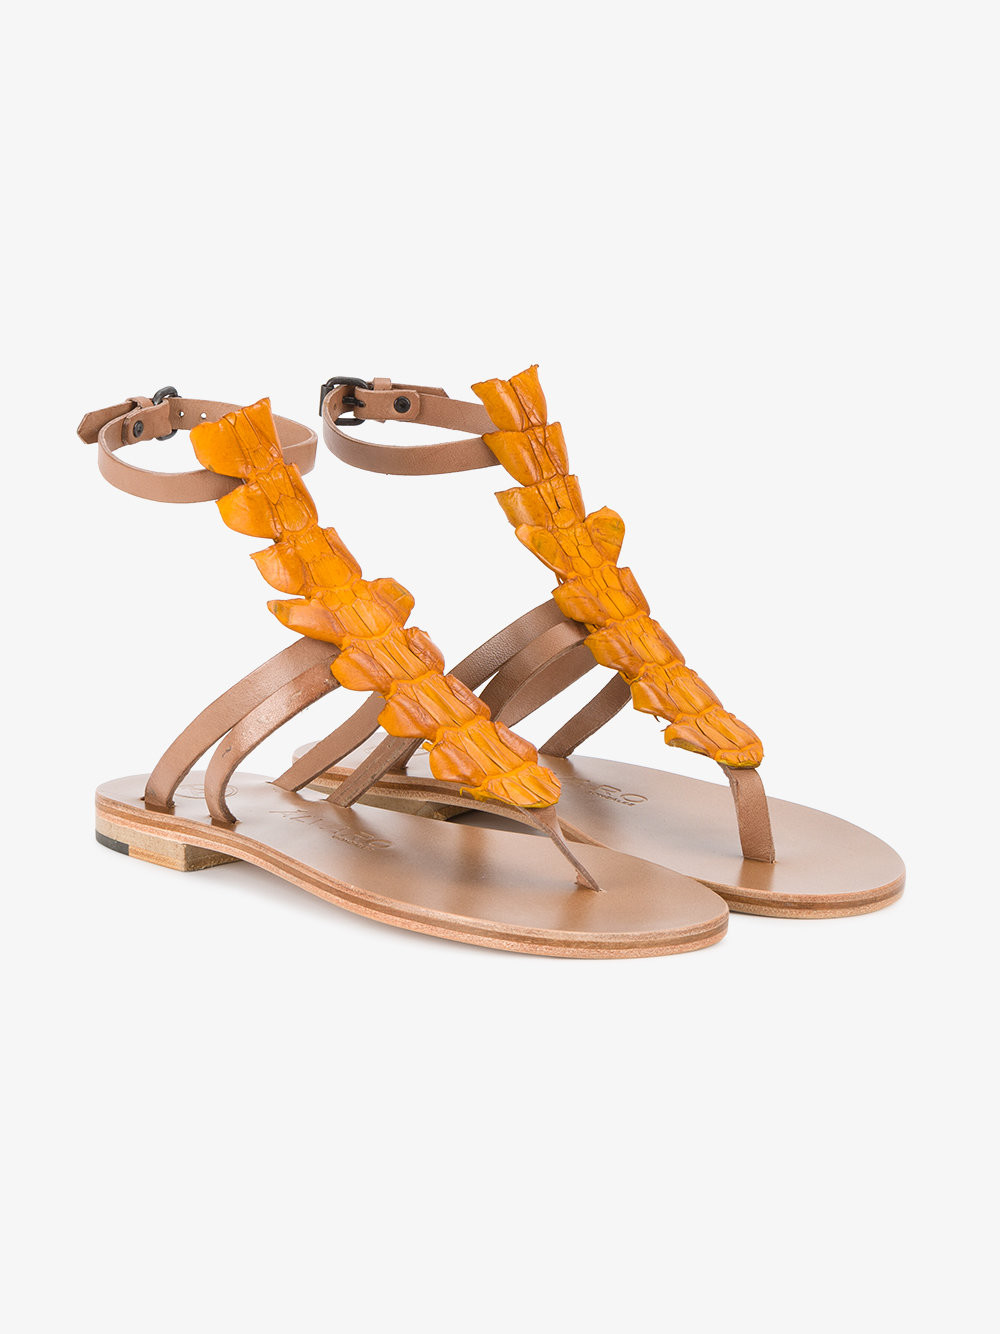 Miss Selfridge Embellished Espadrille Sandal